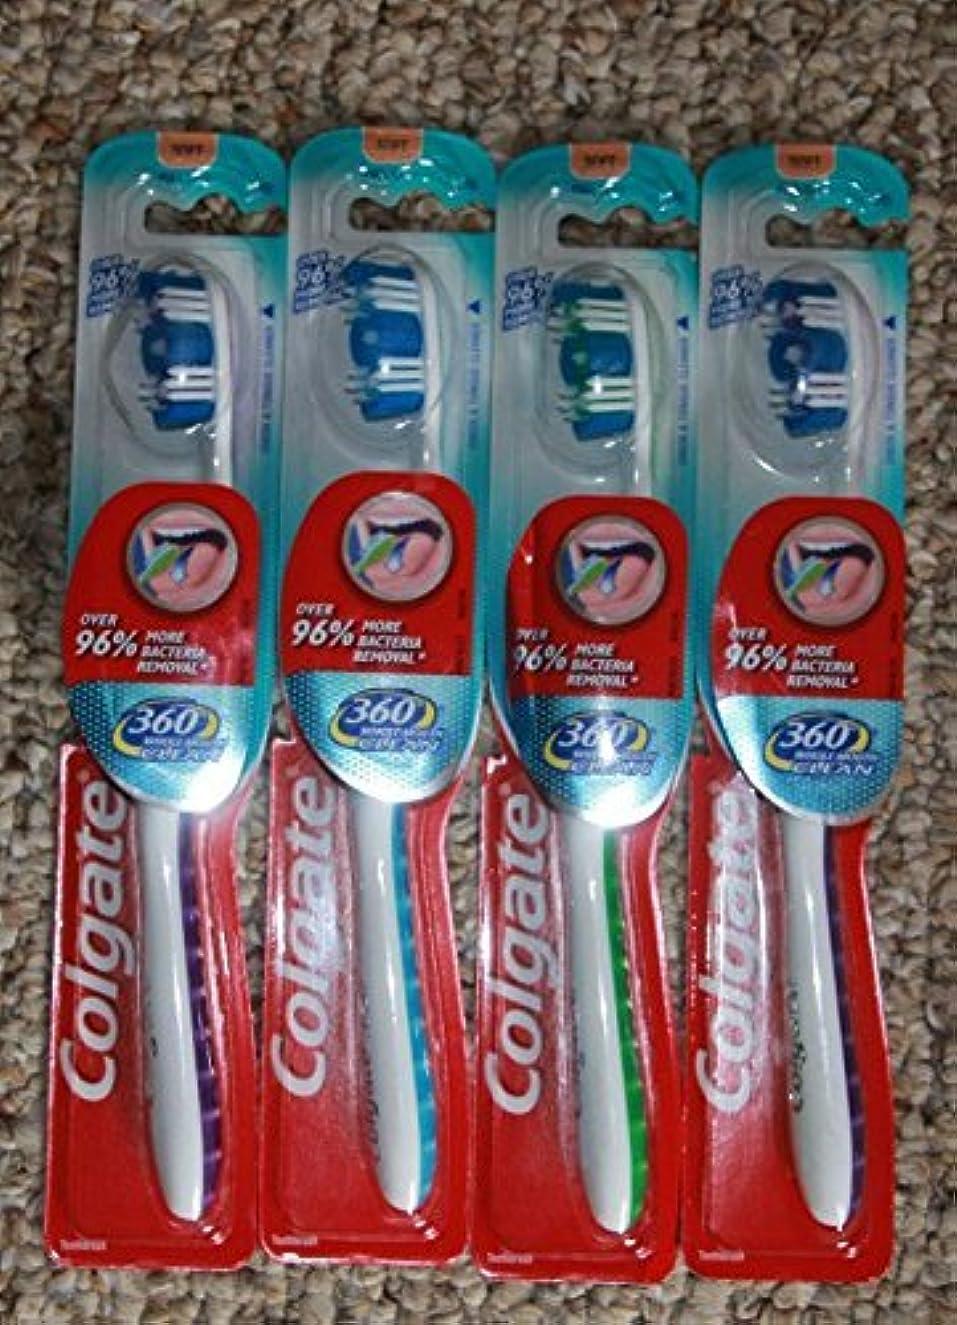 Colgate Palmolive コルゲート歯ブラシ360口全体のクリーン完全な頭部ソフト